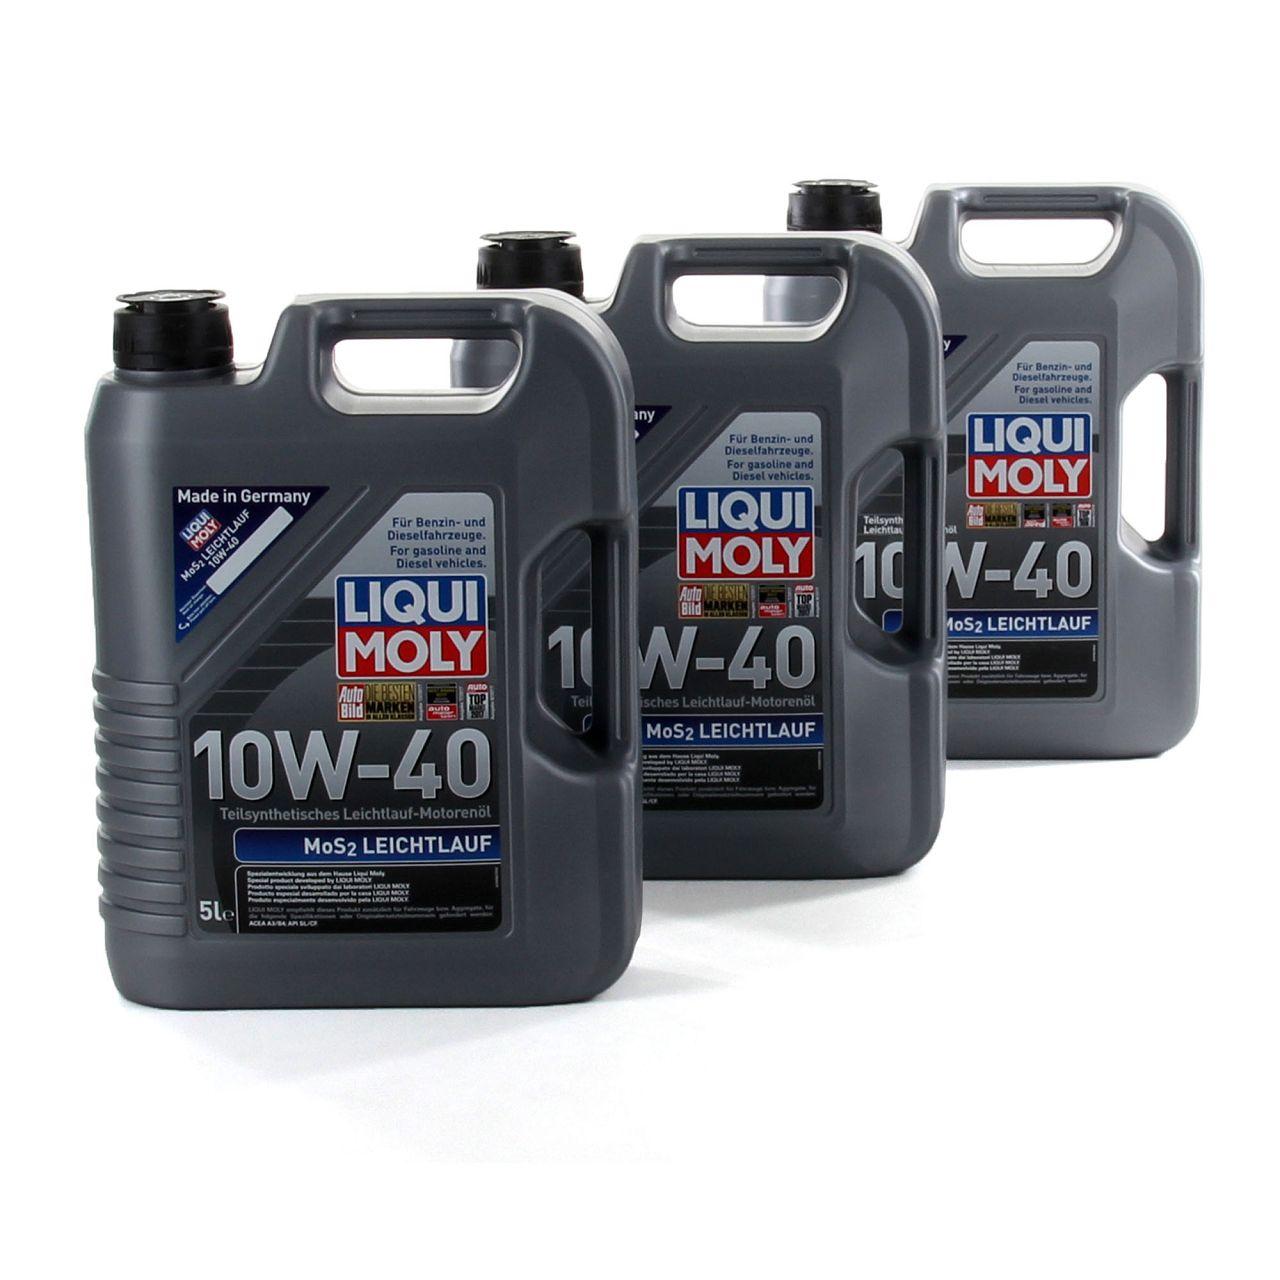 LIQUI MOLY Motoröl Öl MoS2 LEICHTLAUF 10W40 10W-40 15L 15 Liter 1092